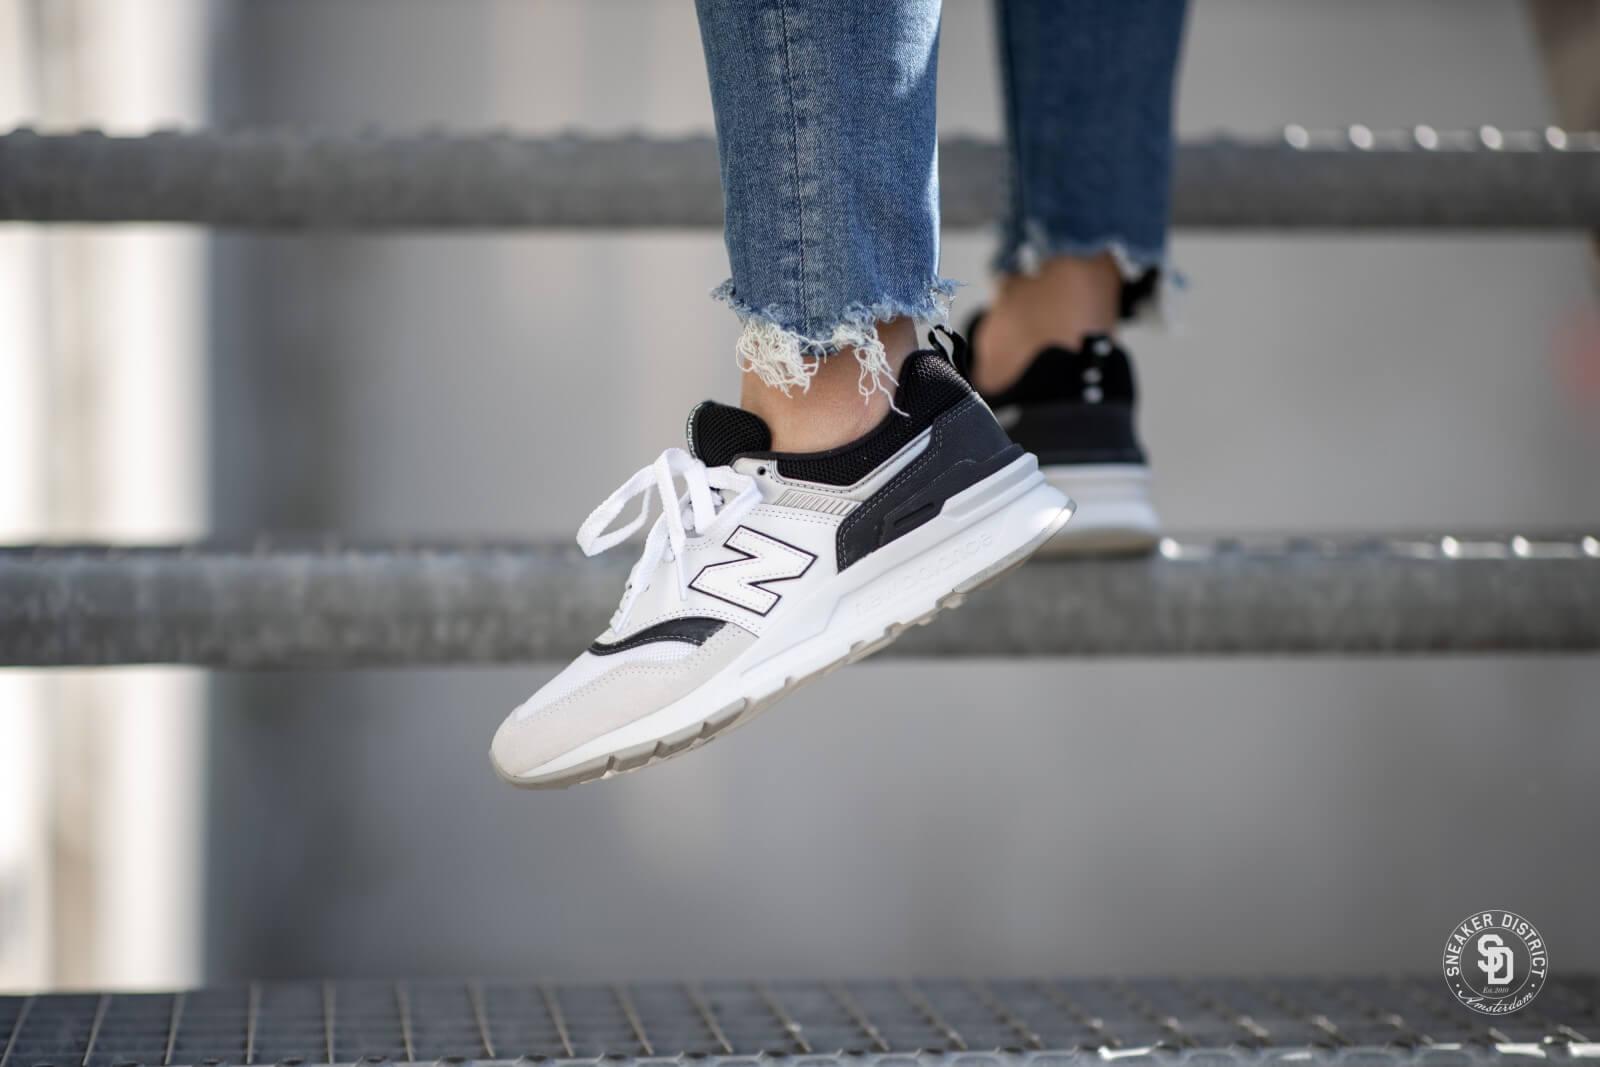 New Balance CW997 HEB Black/White